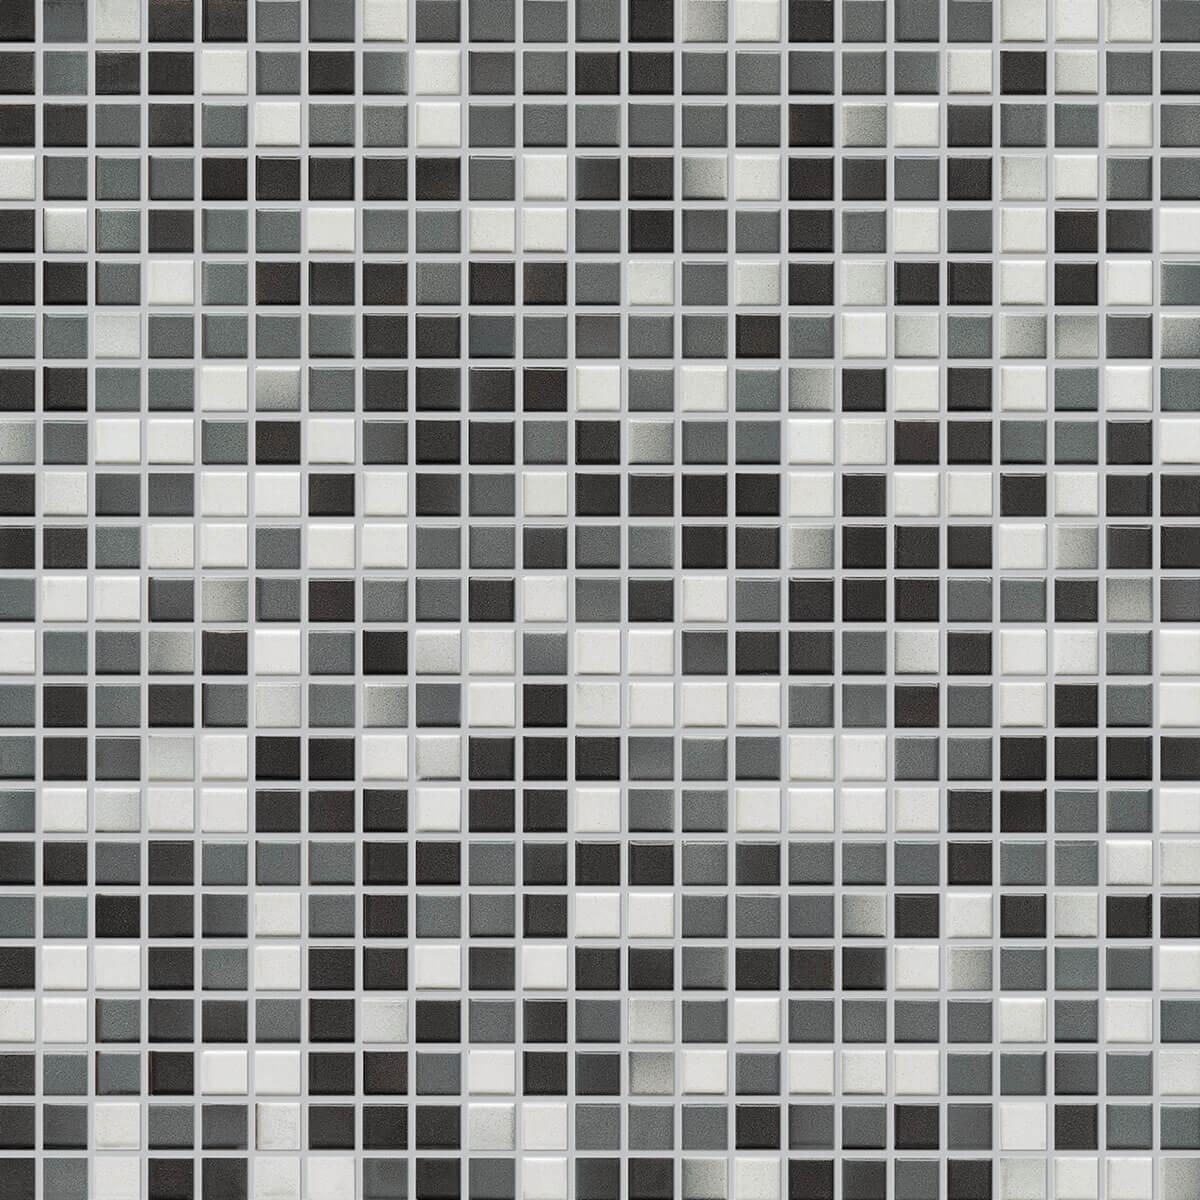 Agrob Buchtal Tiles - KLAY_Plural-_0001_GREY1X1-–-5550I-7150H-SPHERE-NEUTRAL